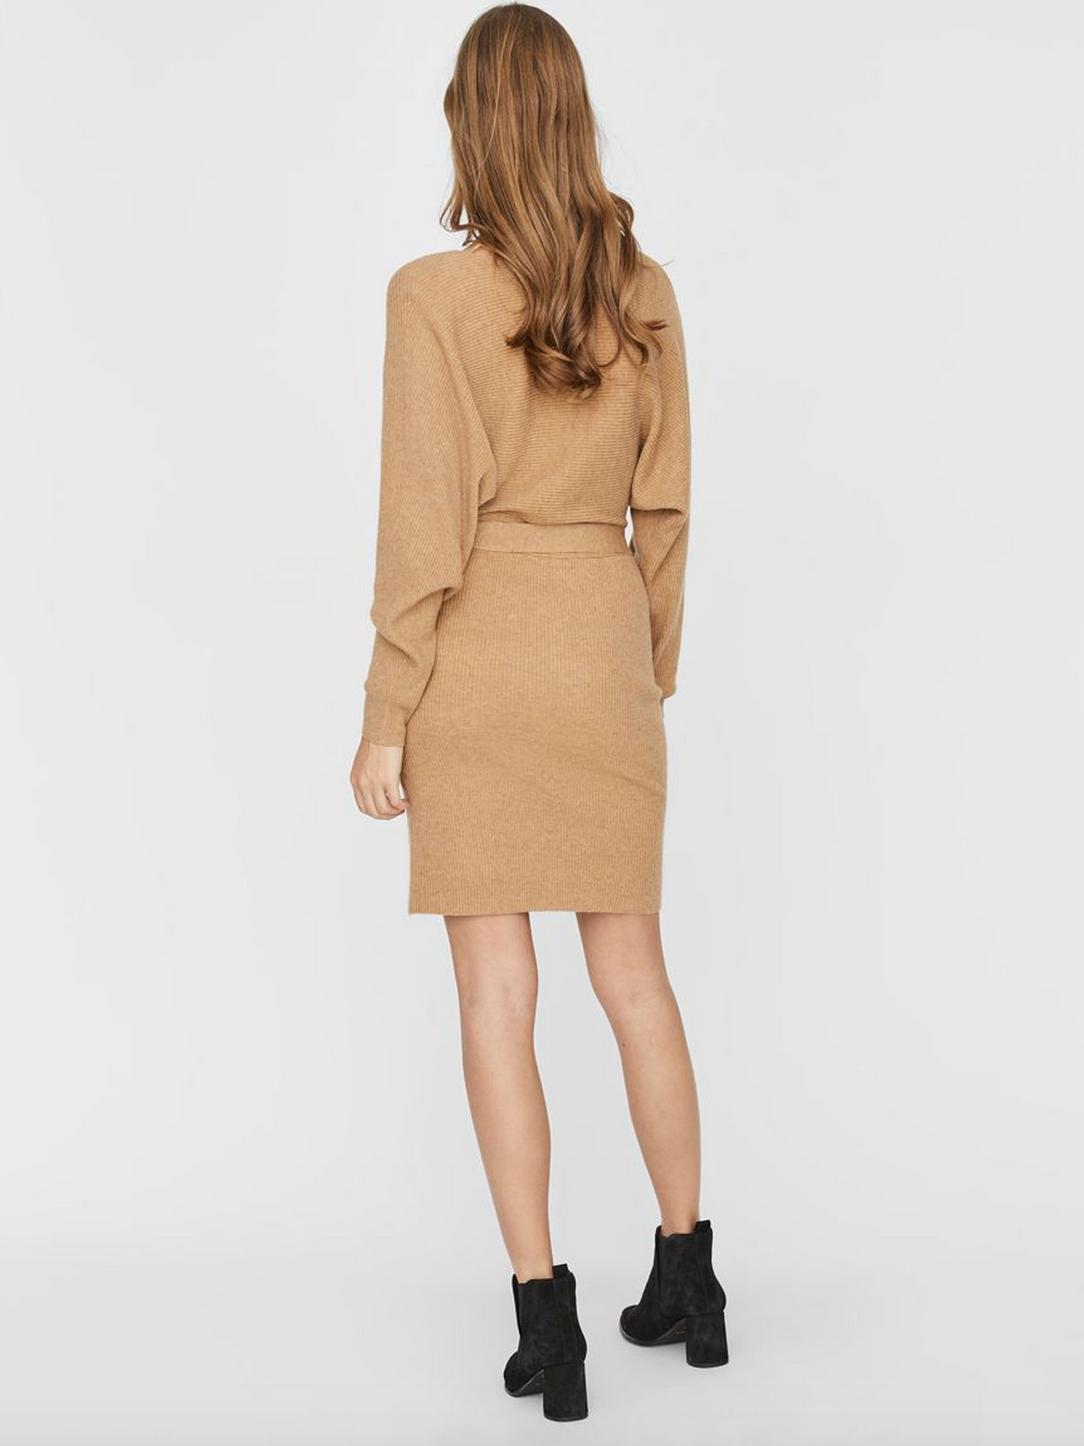 Vero Moda - cross over vneck sweater dress